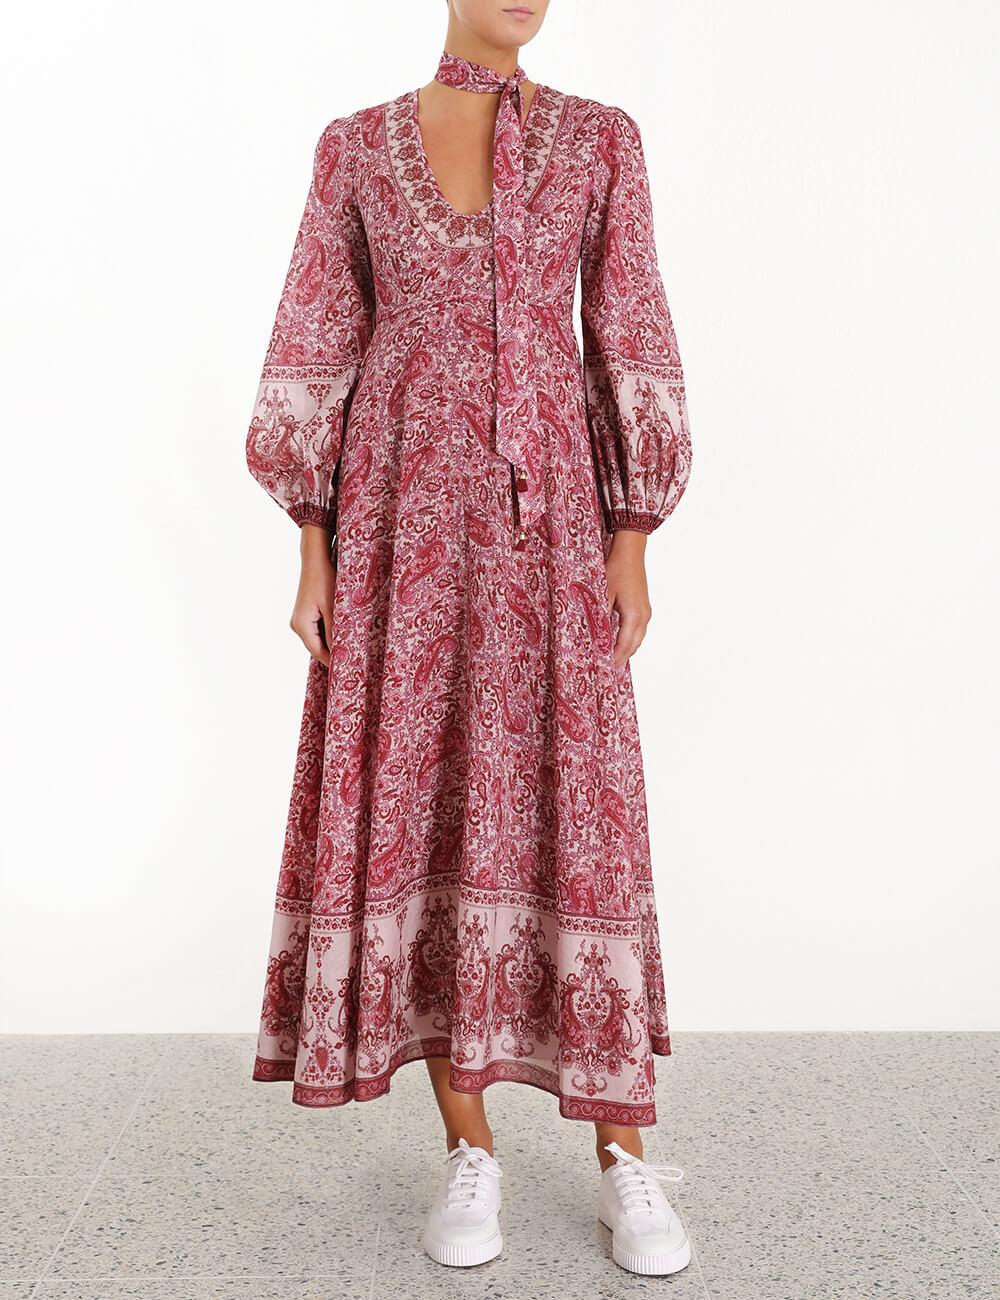 Amari Plunge Dress